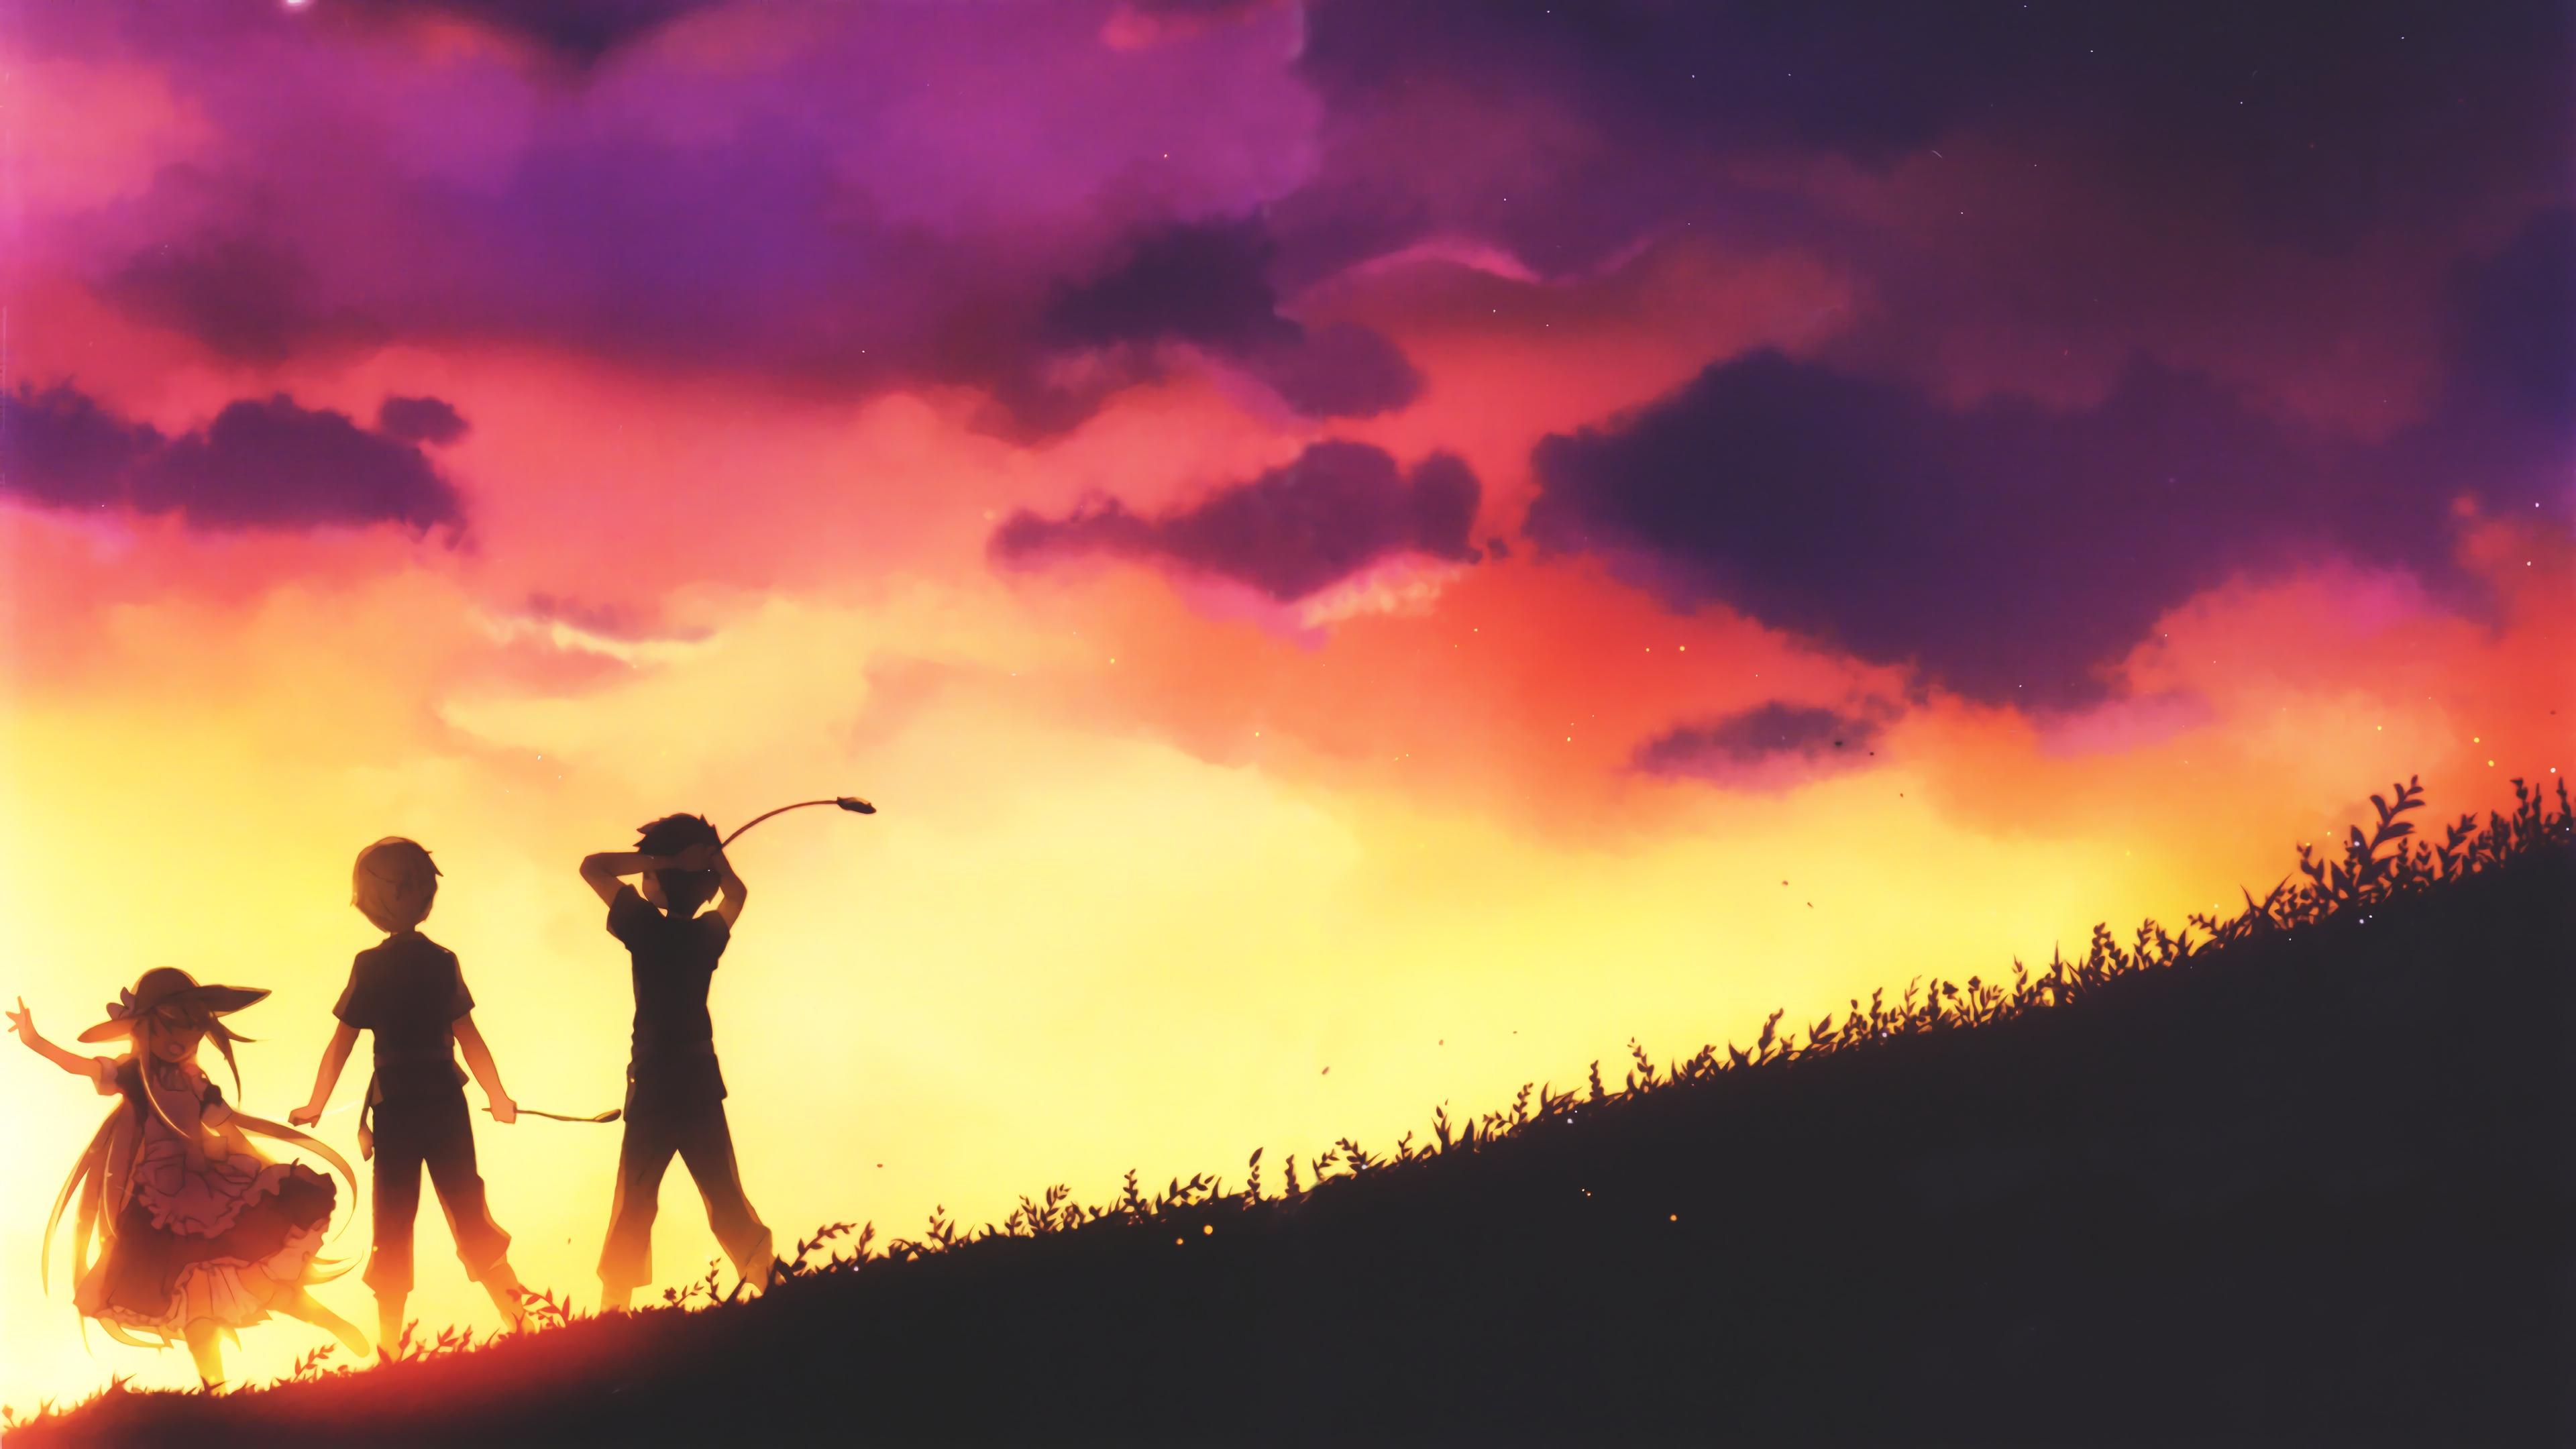 Anime Wallpaper Images Alice Eugeo Kirito Sword Art Online Alicization 4k 25415